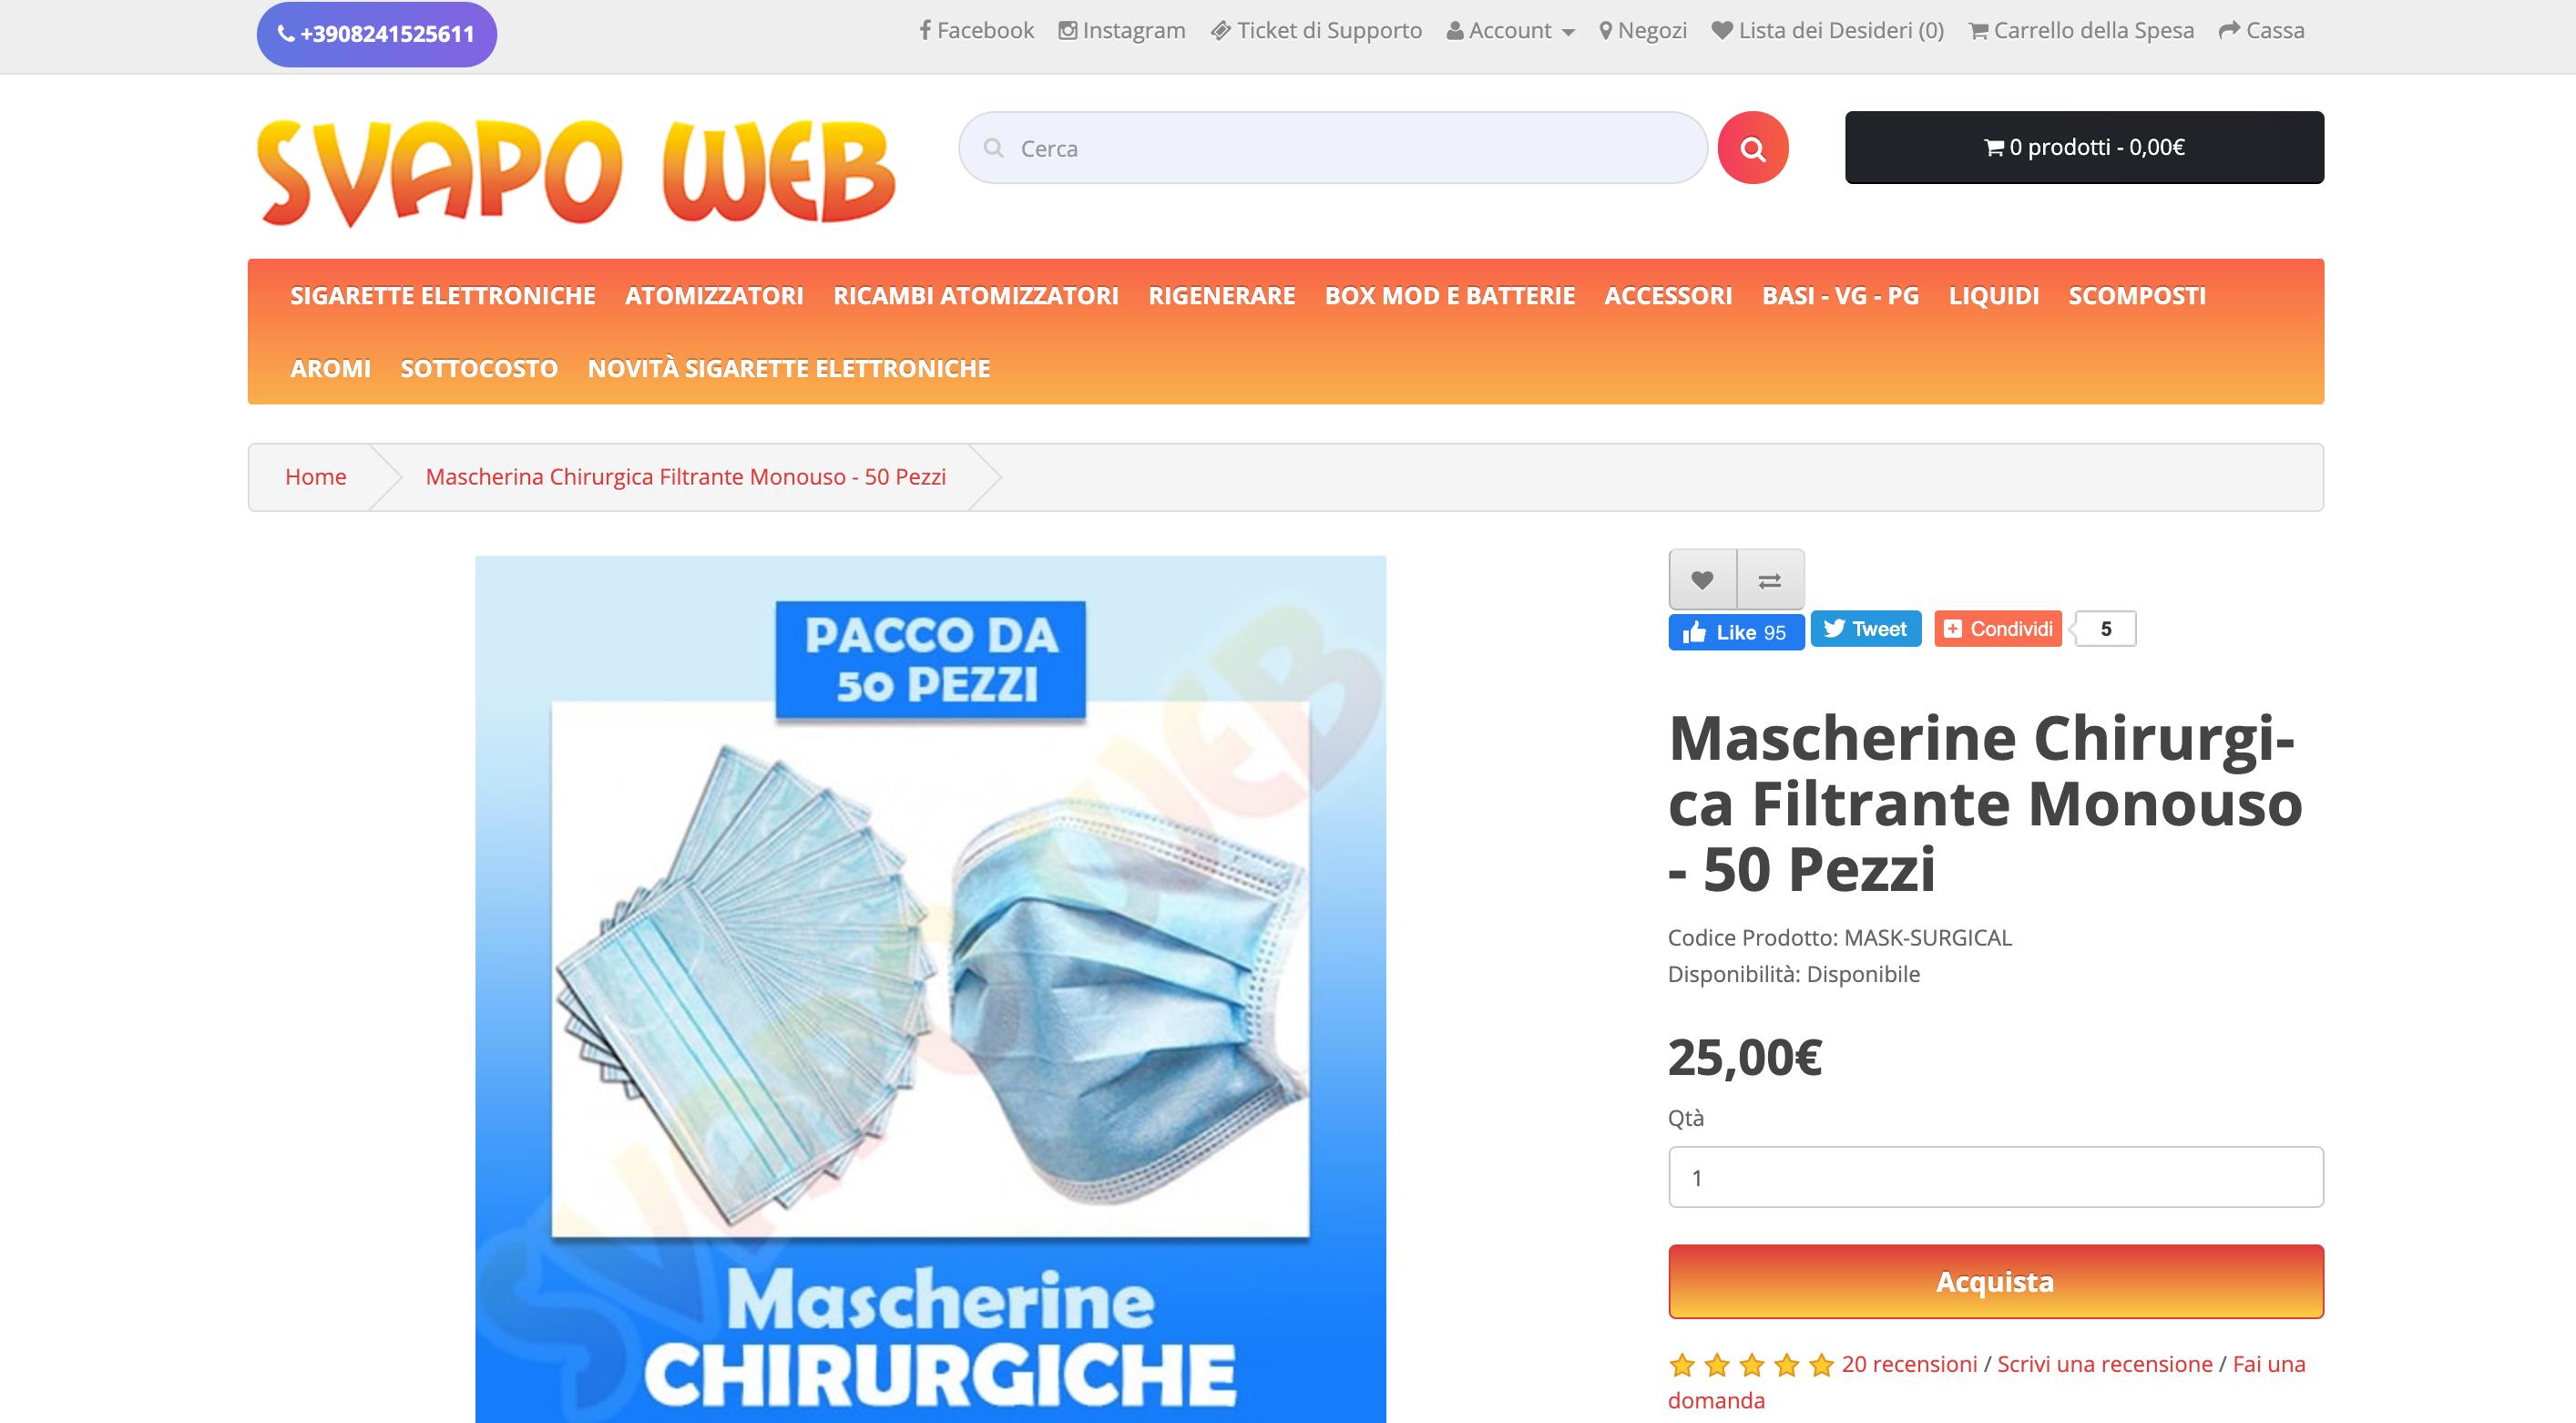 Svapo Web